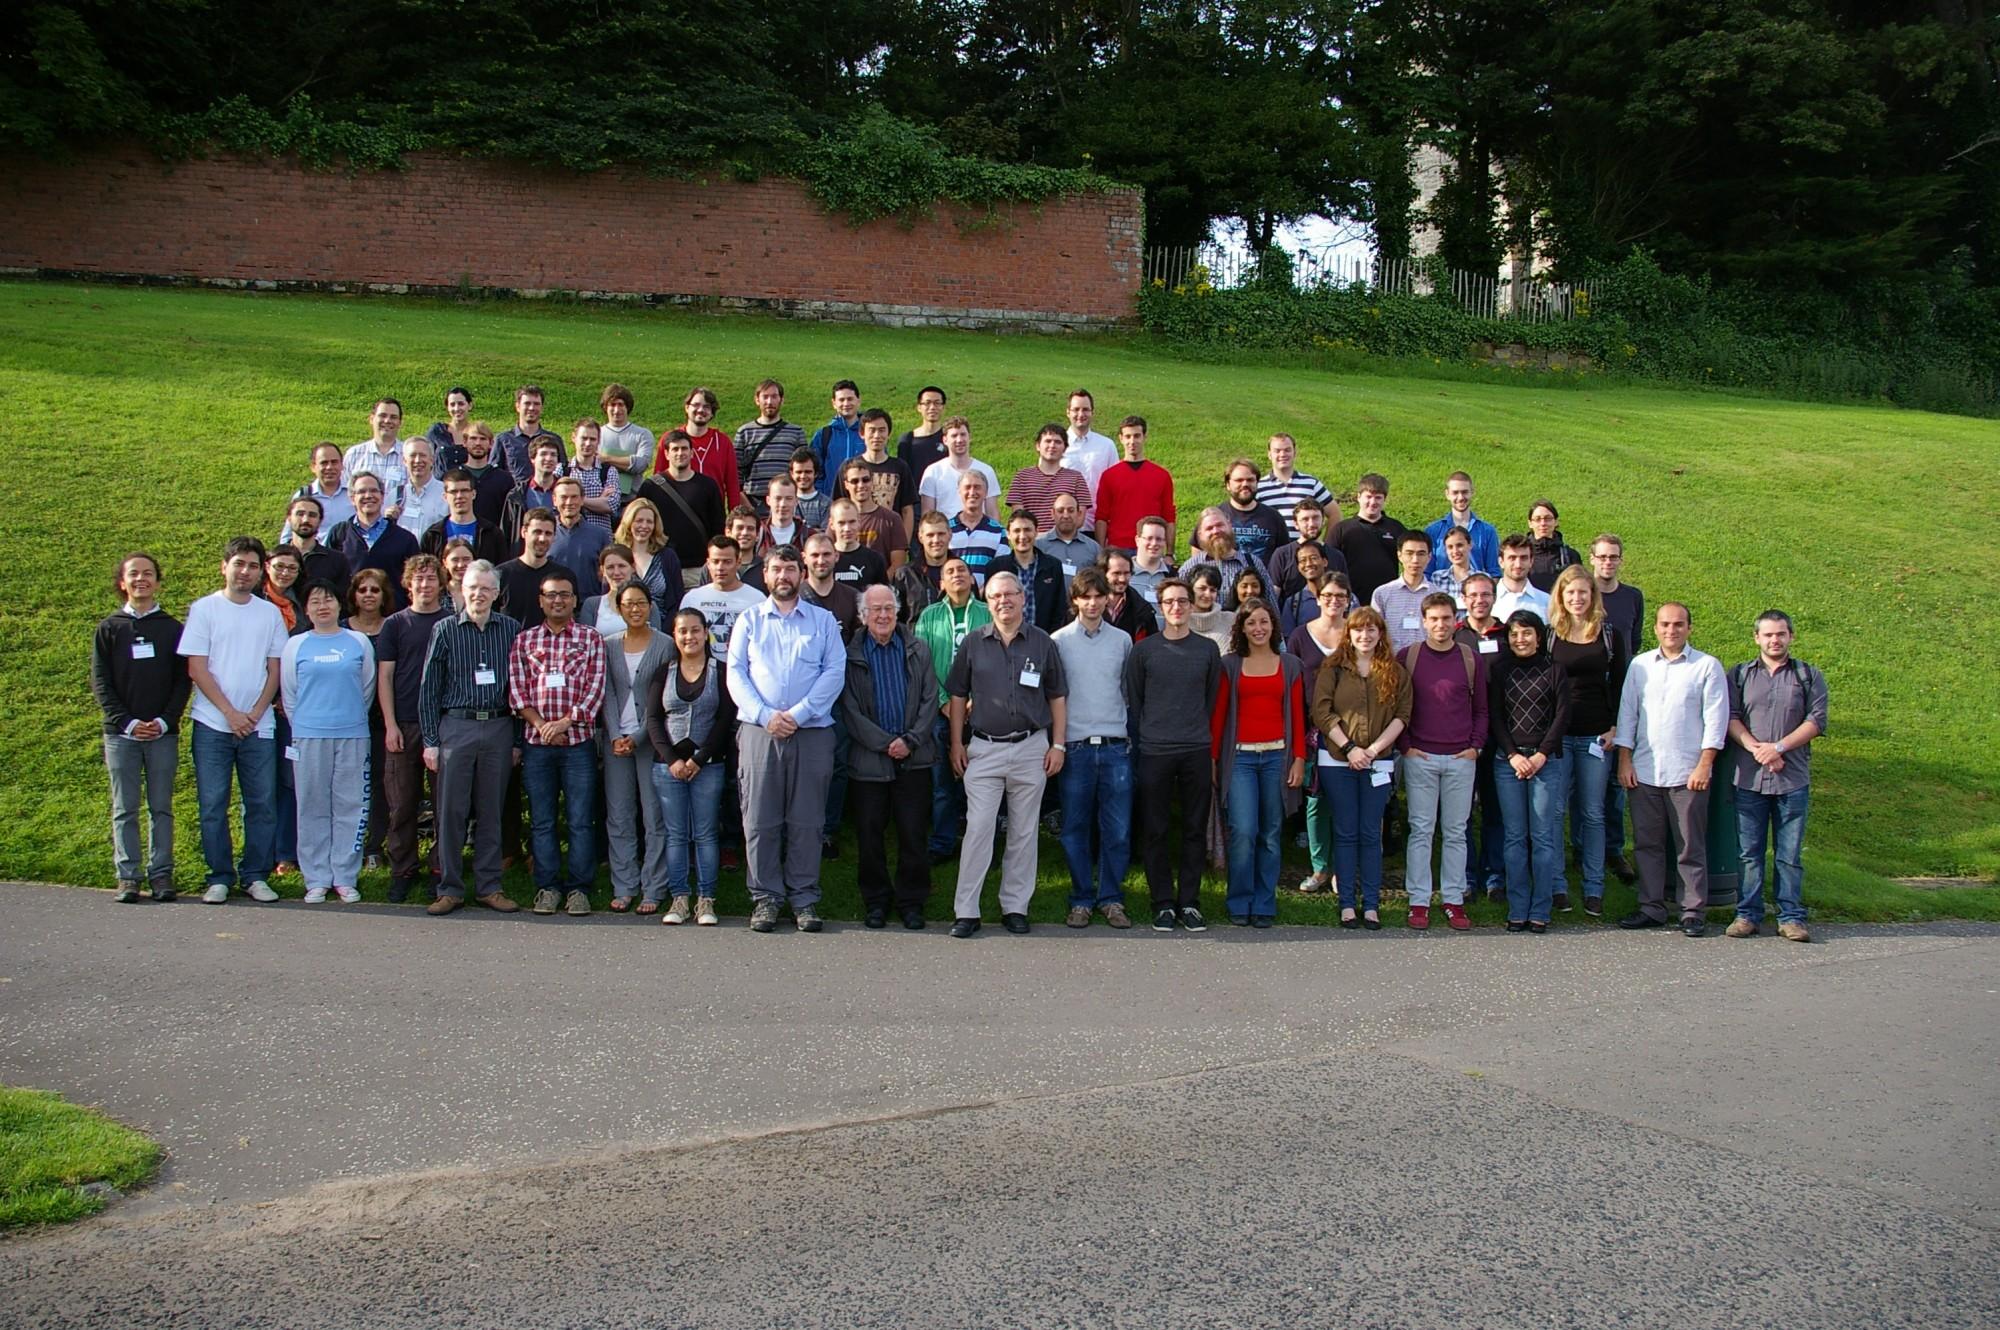 SUSSP69 Group Photograph No. 6 Copyright Alan Walker, University of Edinburgh.